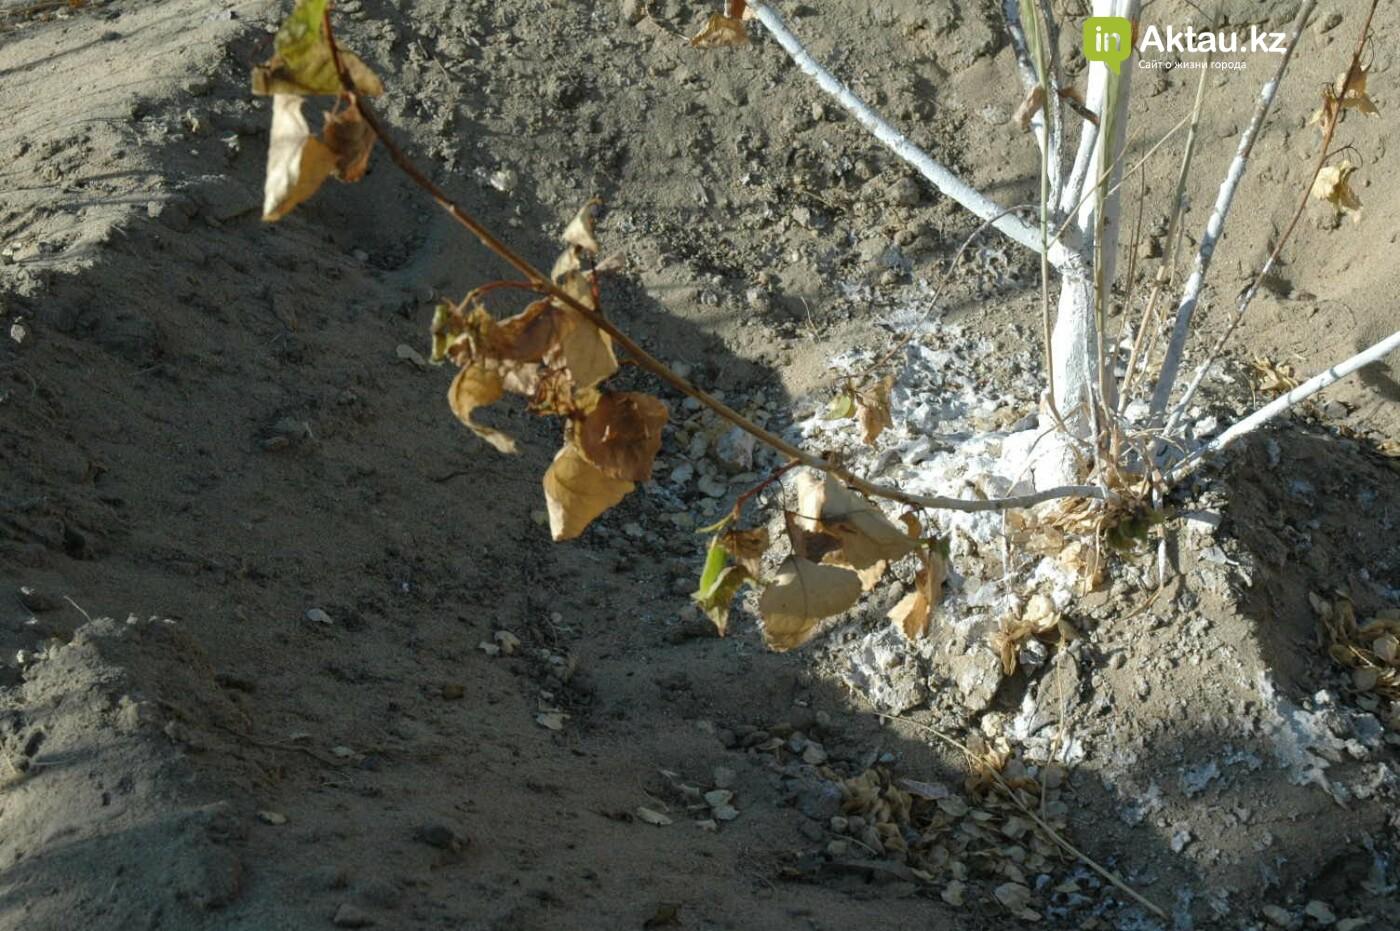 Погибшие от засухи и обезвоживания в Актау исчисляются десятками (ФОТО), фото-20